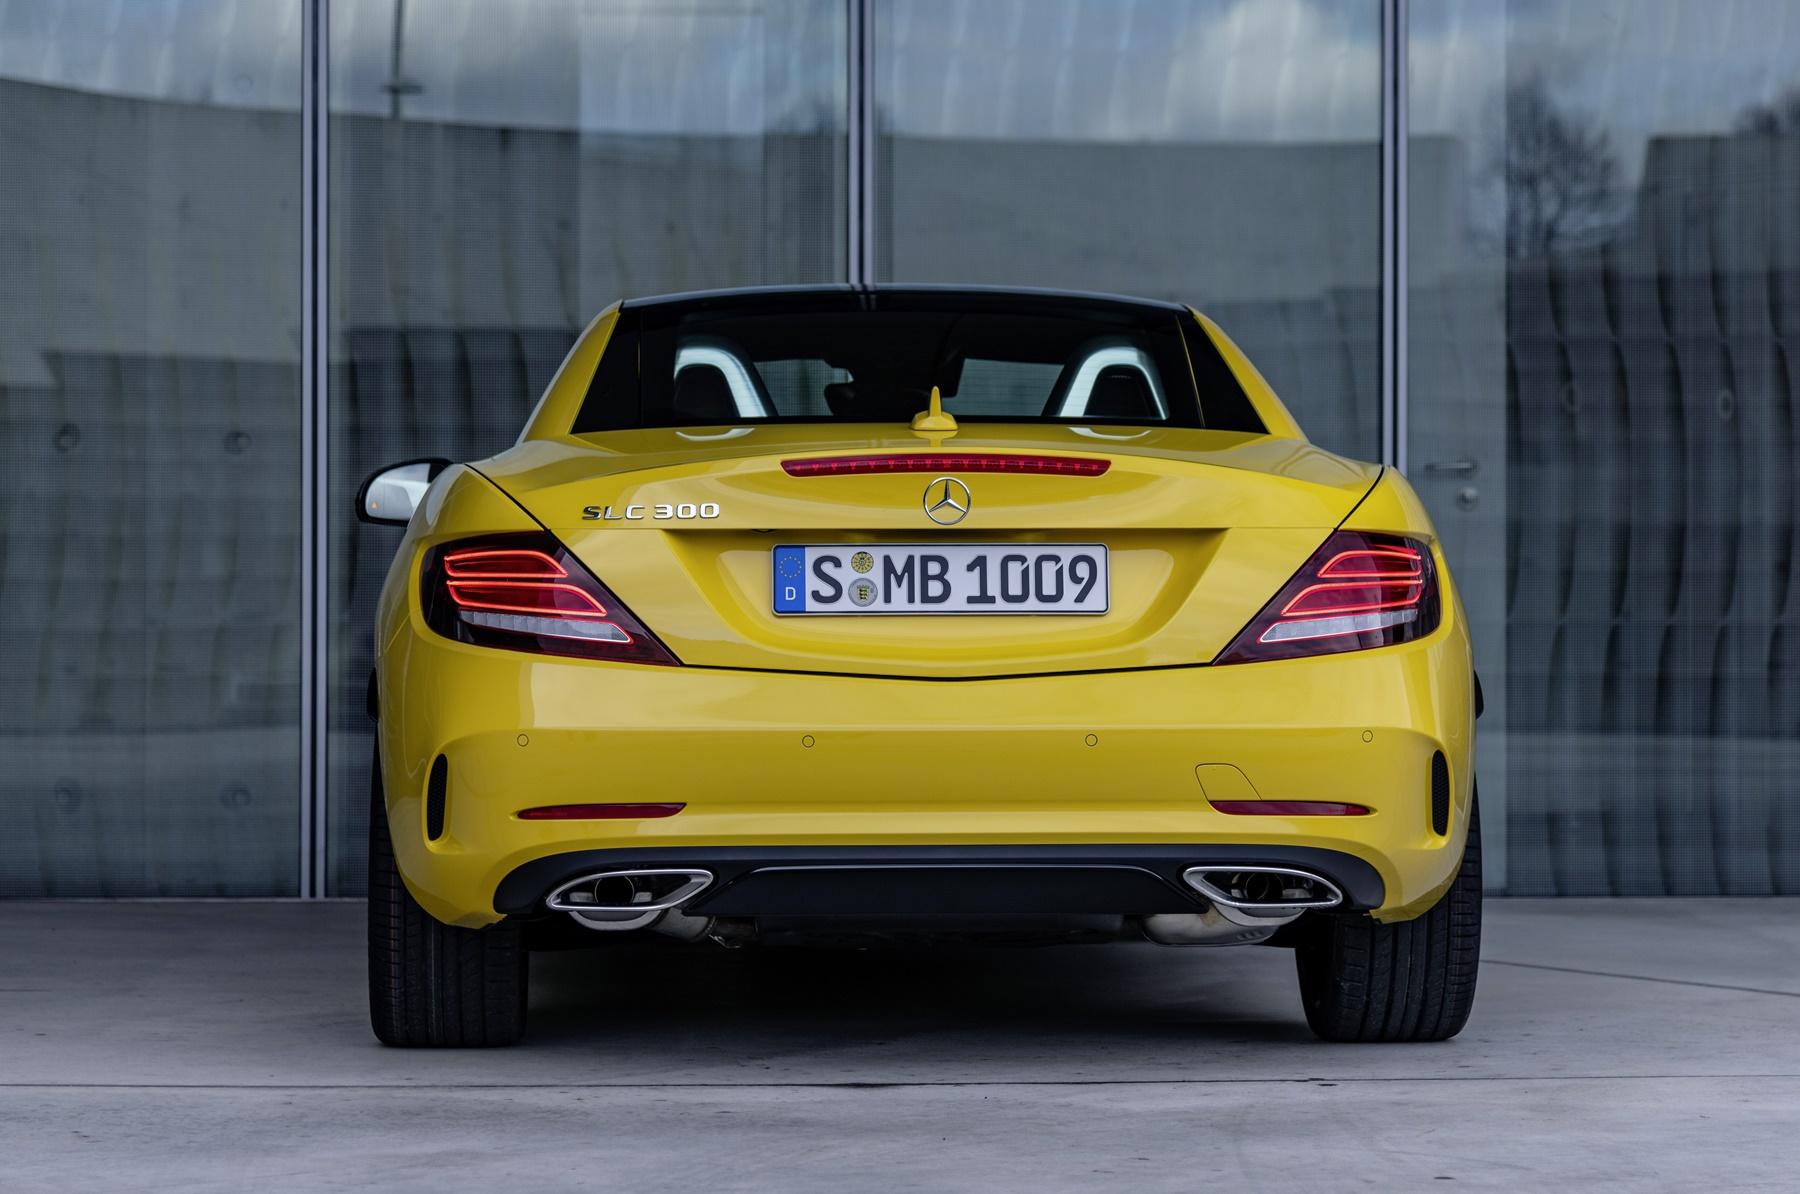 Mercedes SLC / SL: Goodbye Klappdach!